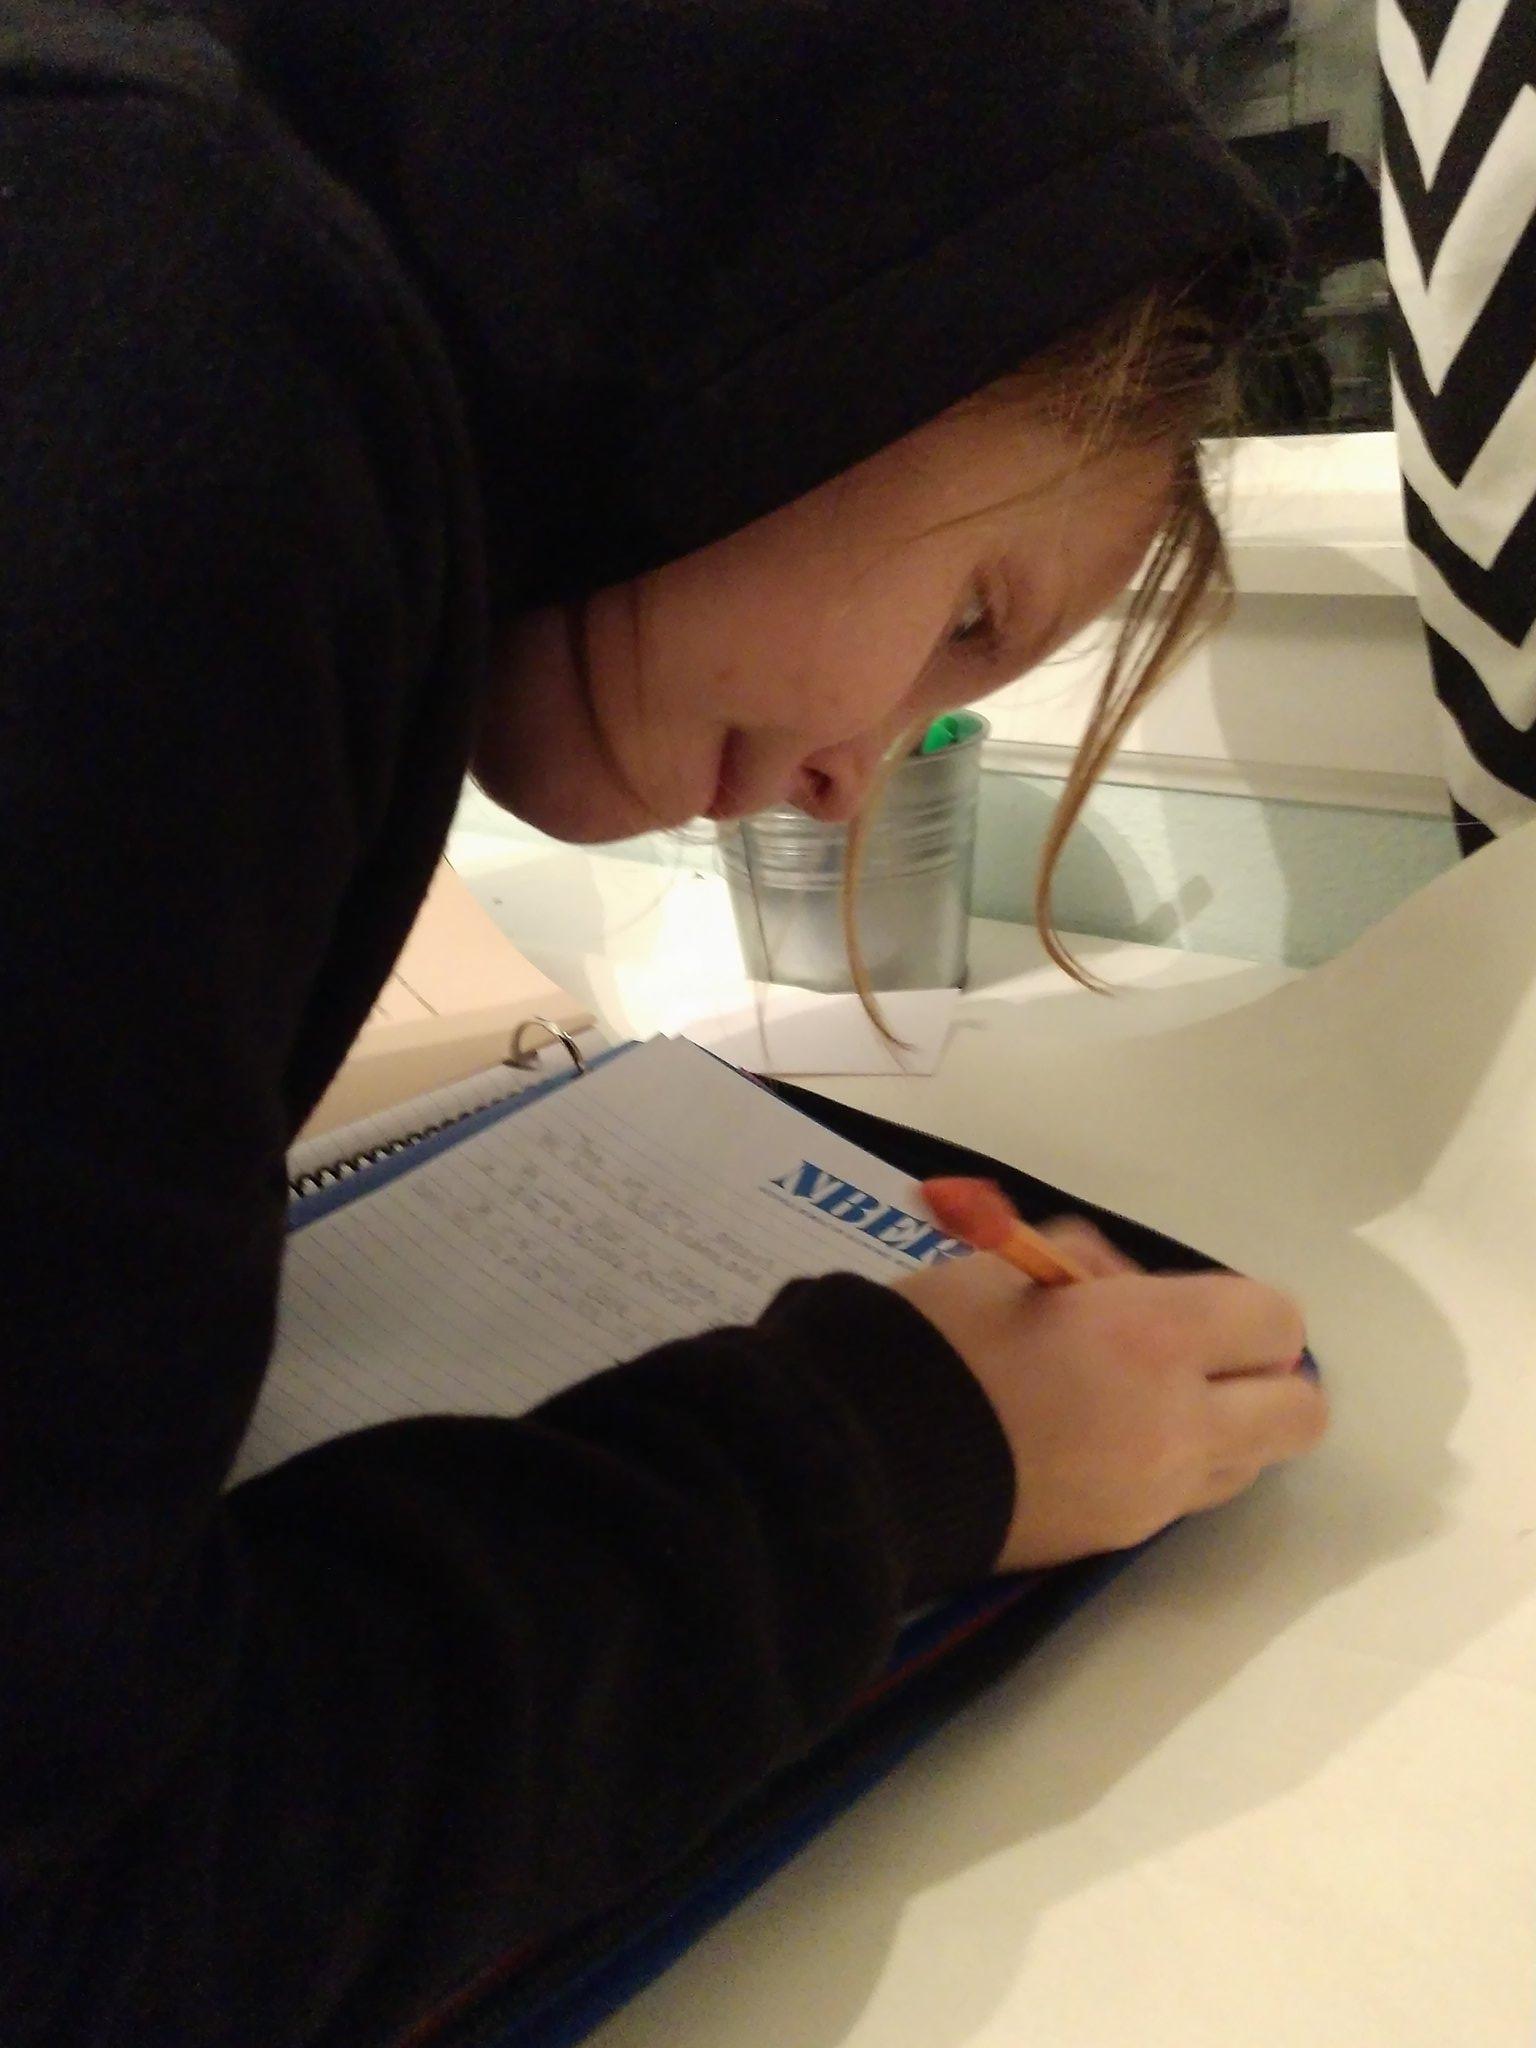 She needed lined paper for her homework . ..@nberpubs https://t.co/OsZqBlxnpm